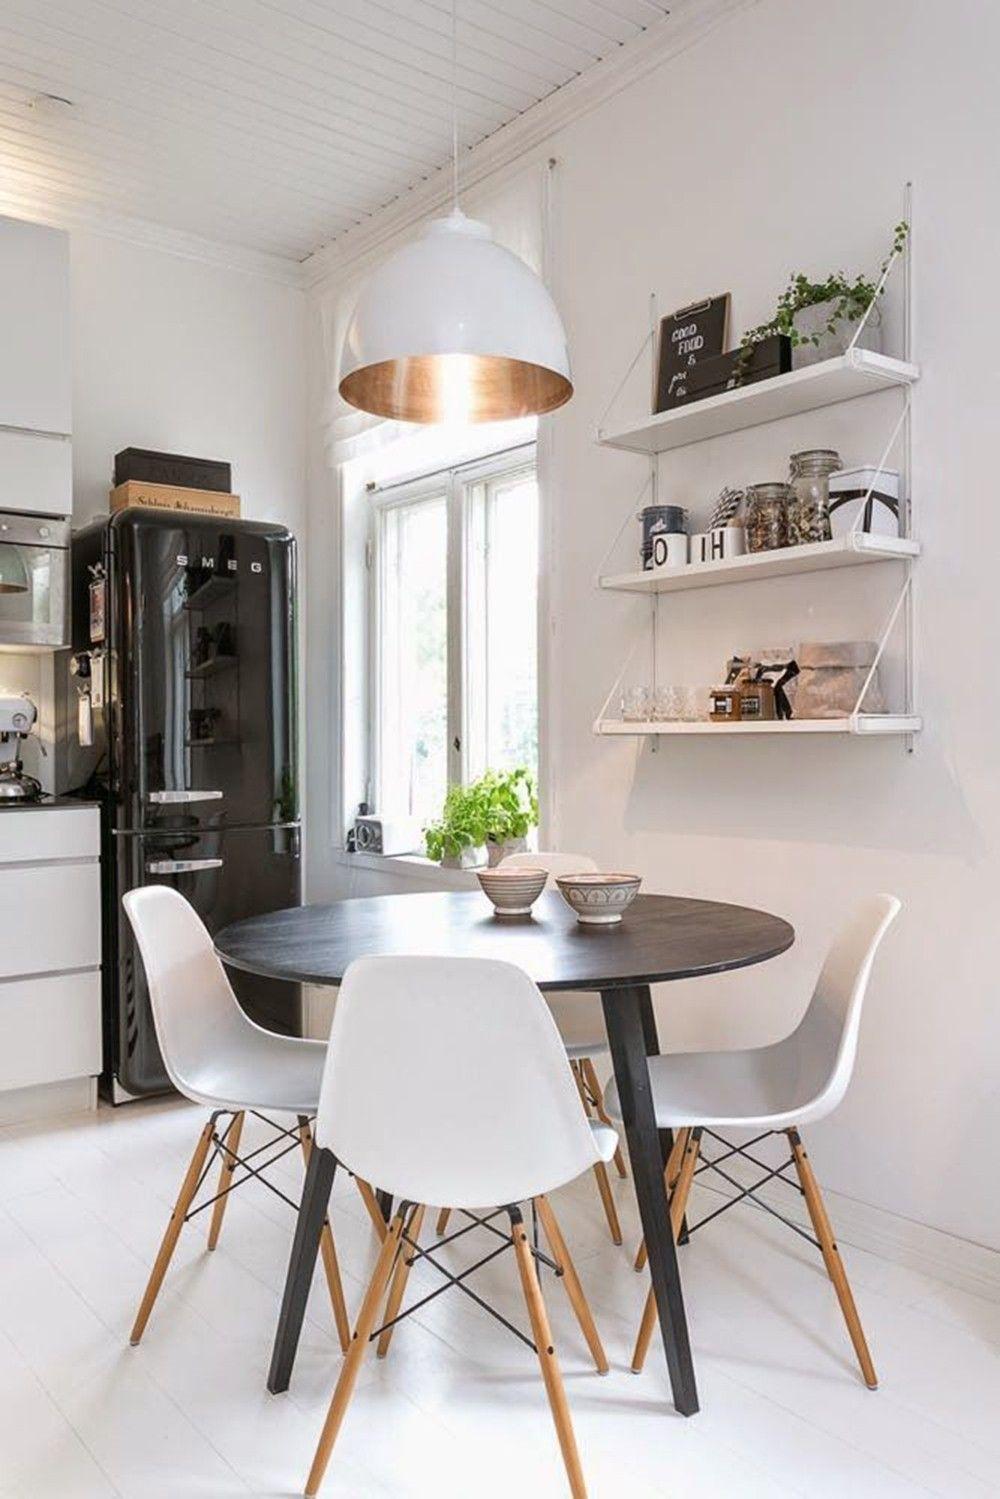 virtuve smeg | house | Pinterest | Smeg fridge, Scandinavian style ...